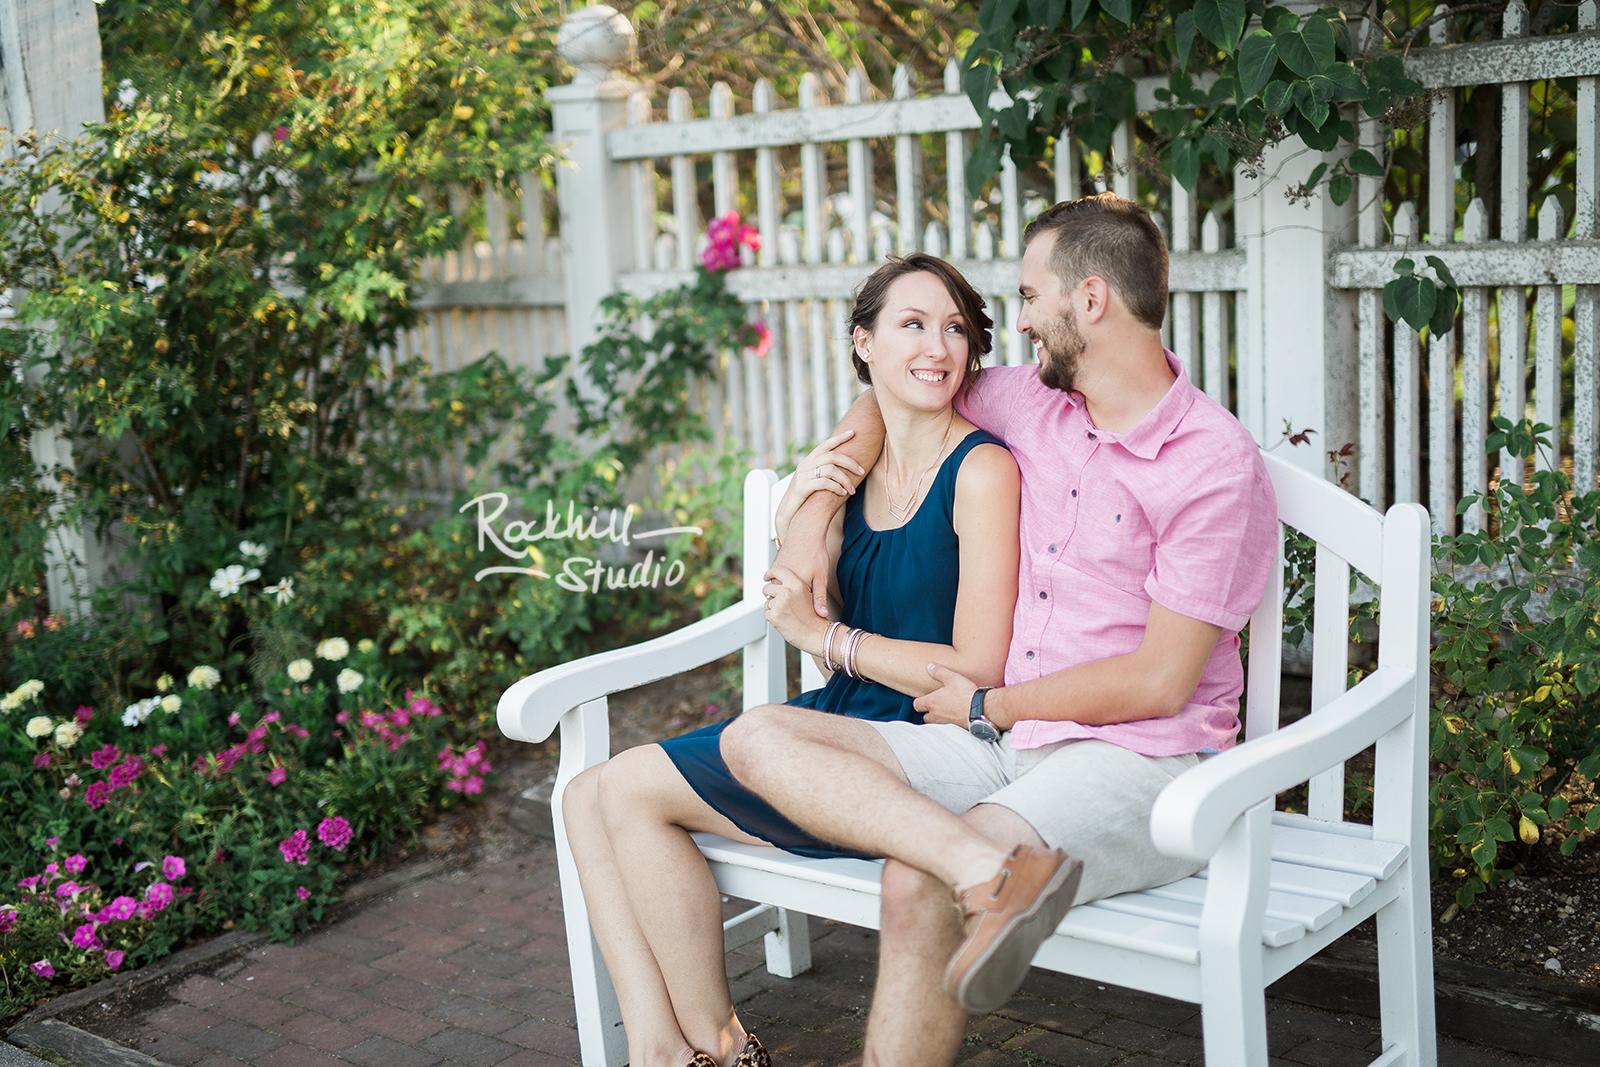 mackinac-island-wedding-engagement-northern-michigan-rockhill-studio-jt-19.jpg